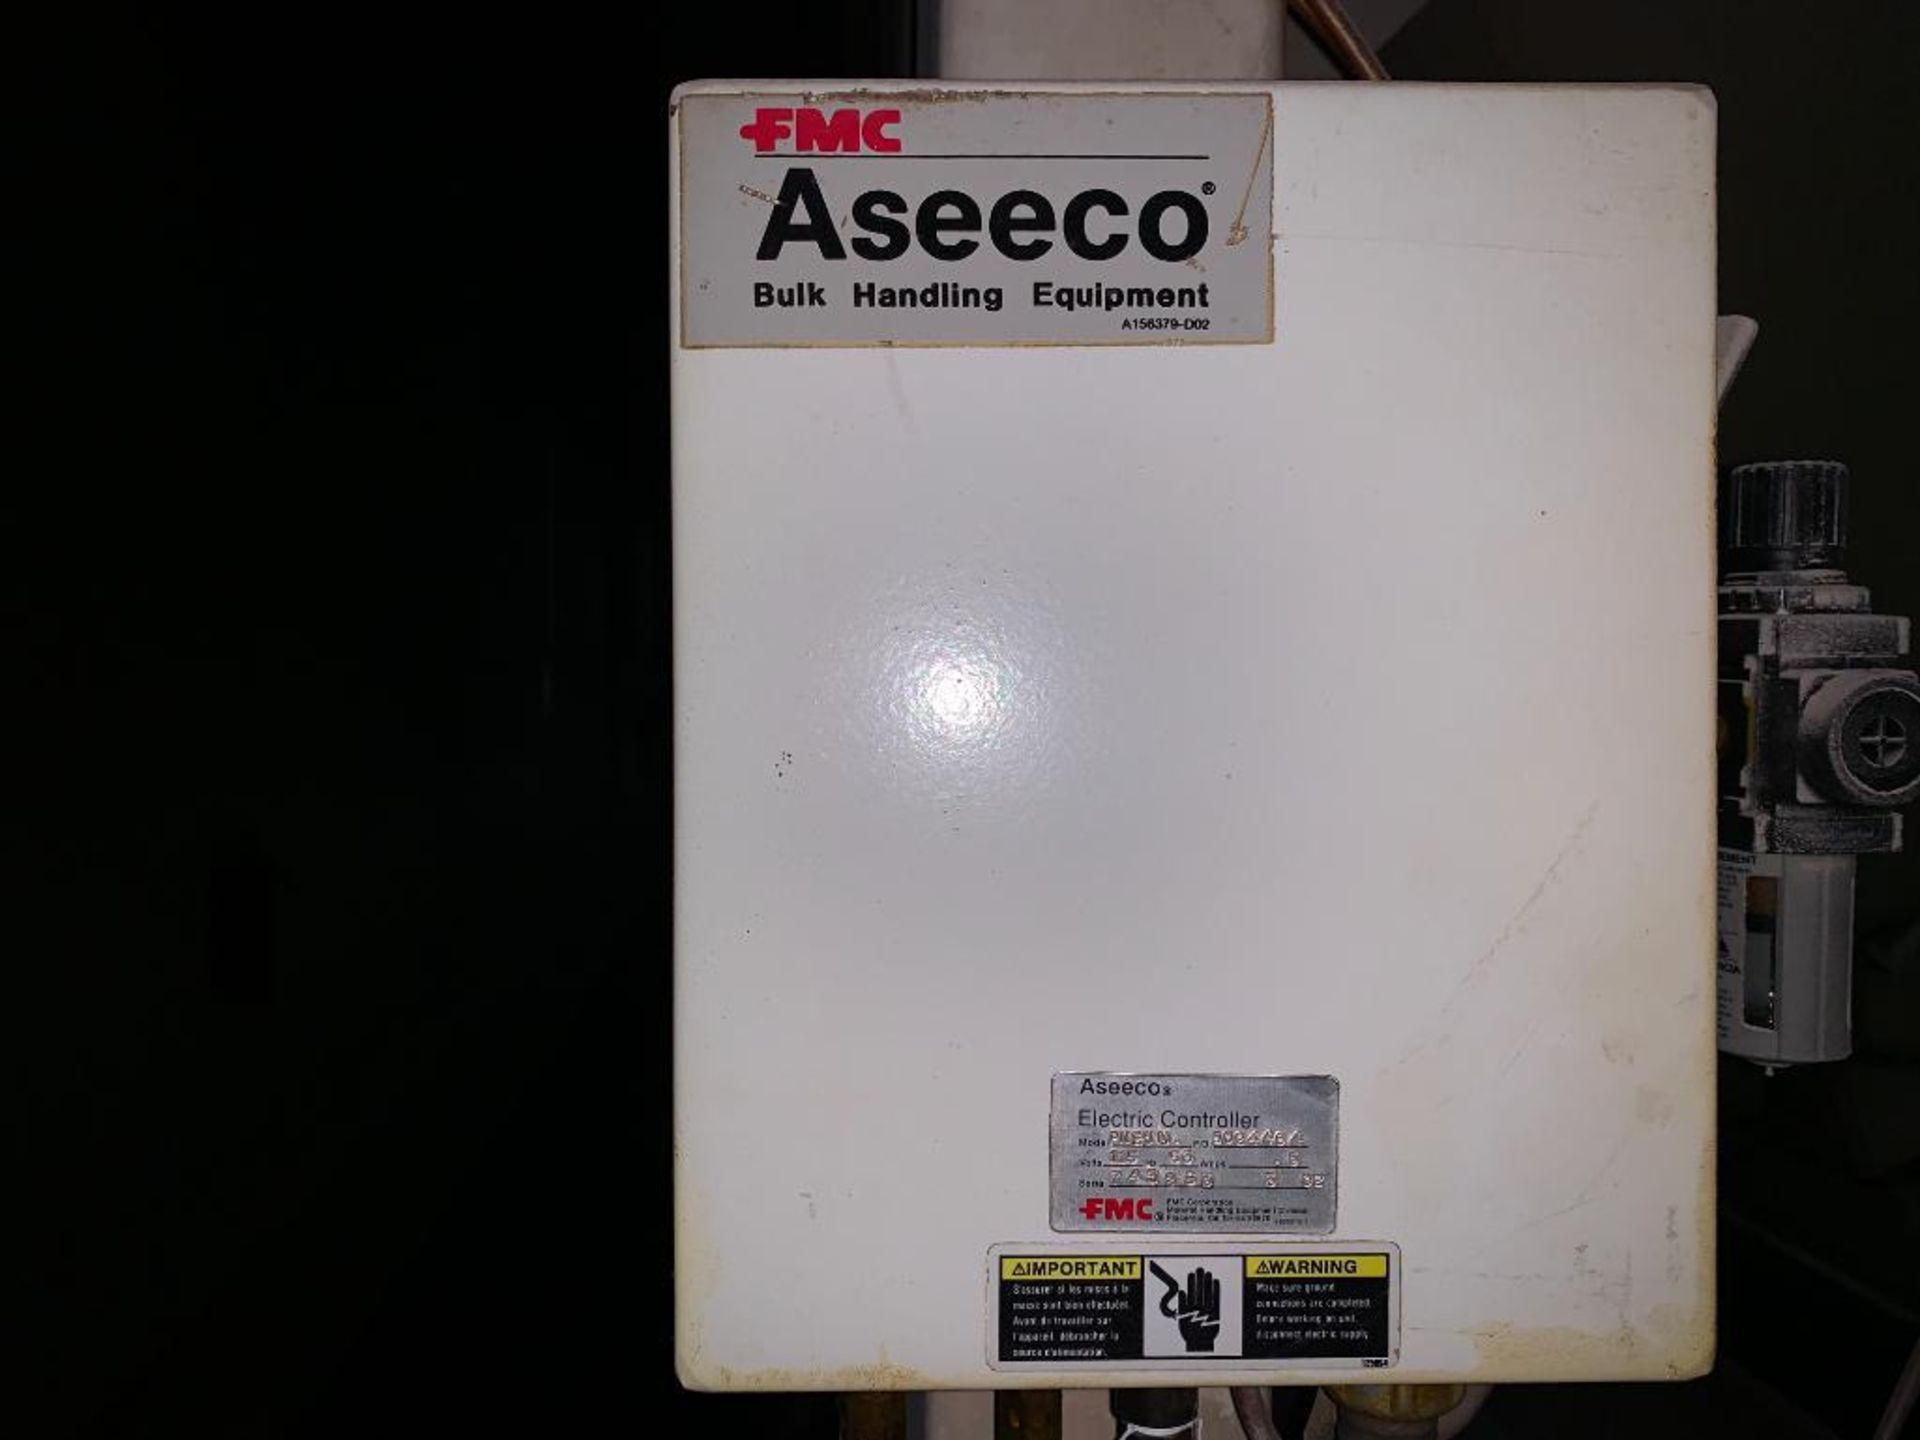 Aseeco mild steel cone bottom bulk storage bin - Image 21 of 25